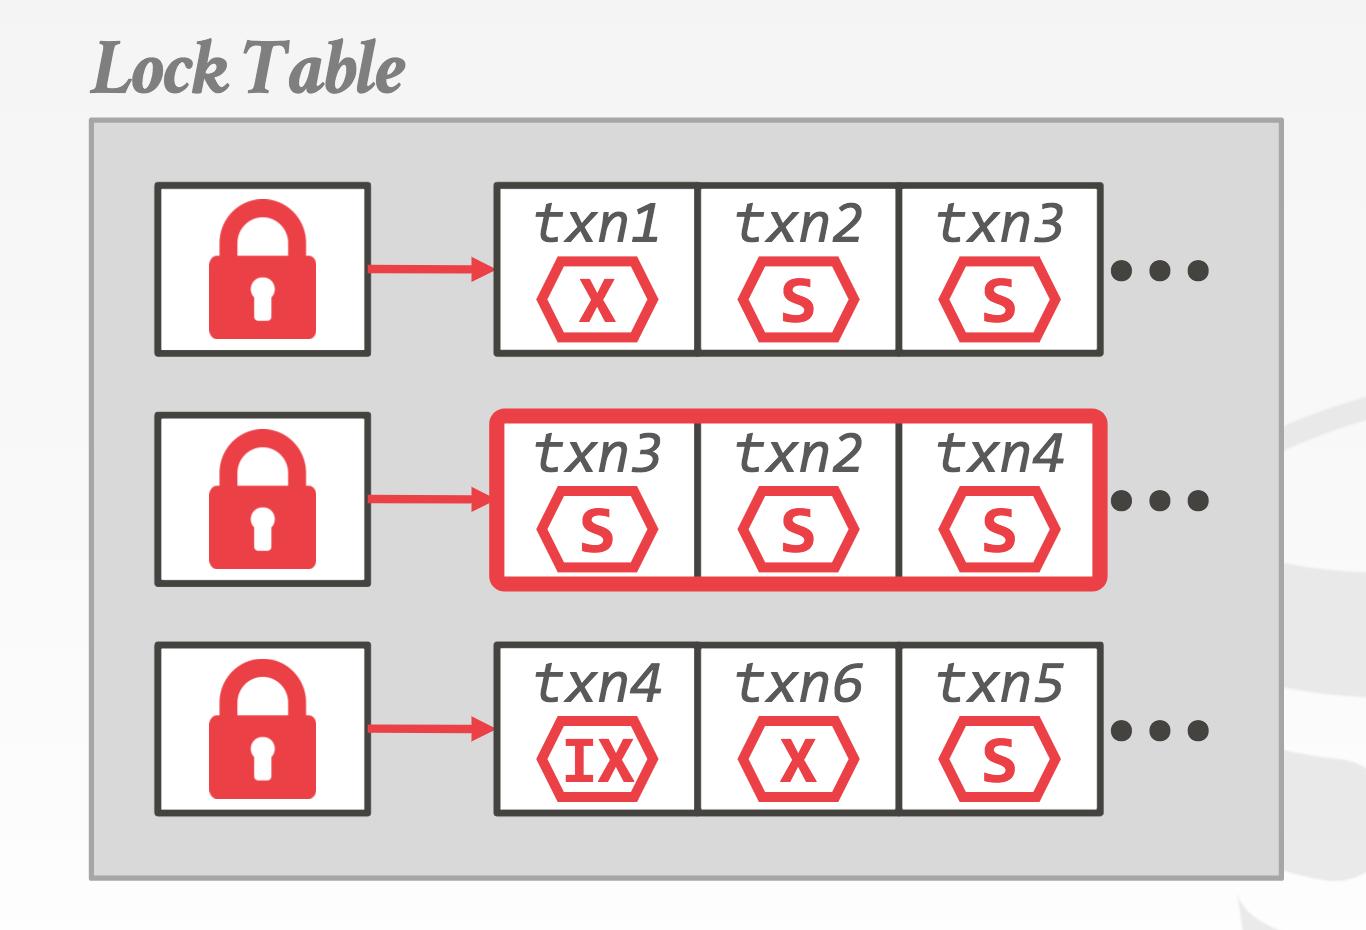 Locking Table